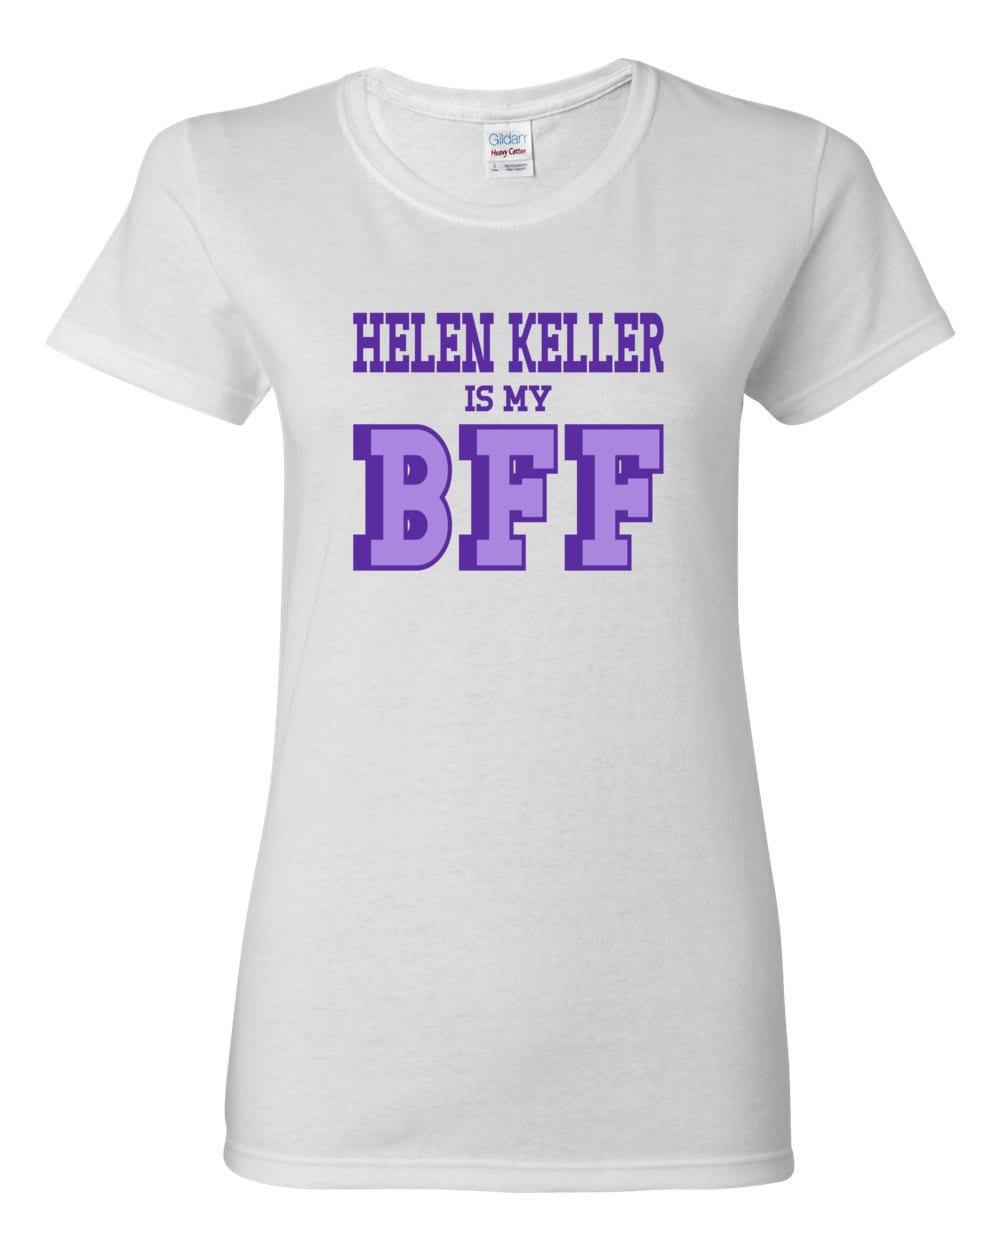 Helen Keller is my BFF Womens T-shirt